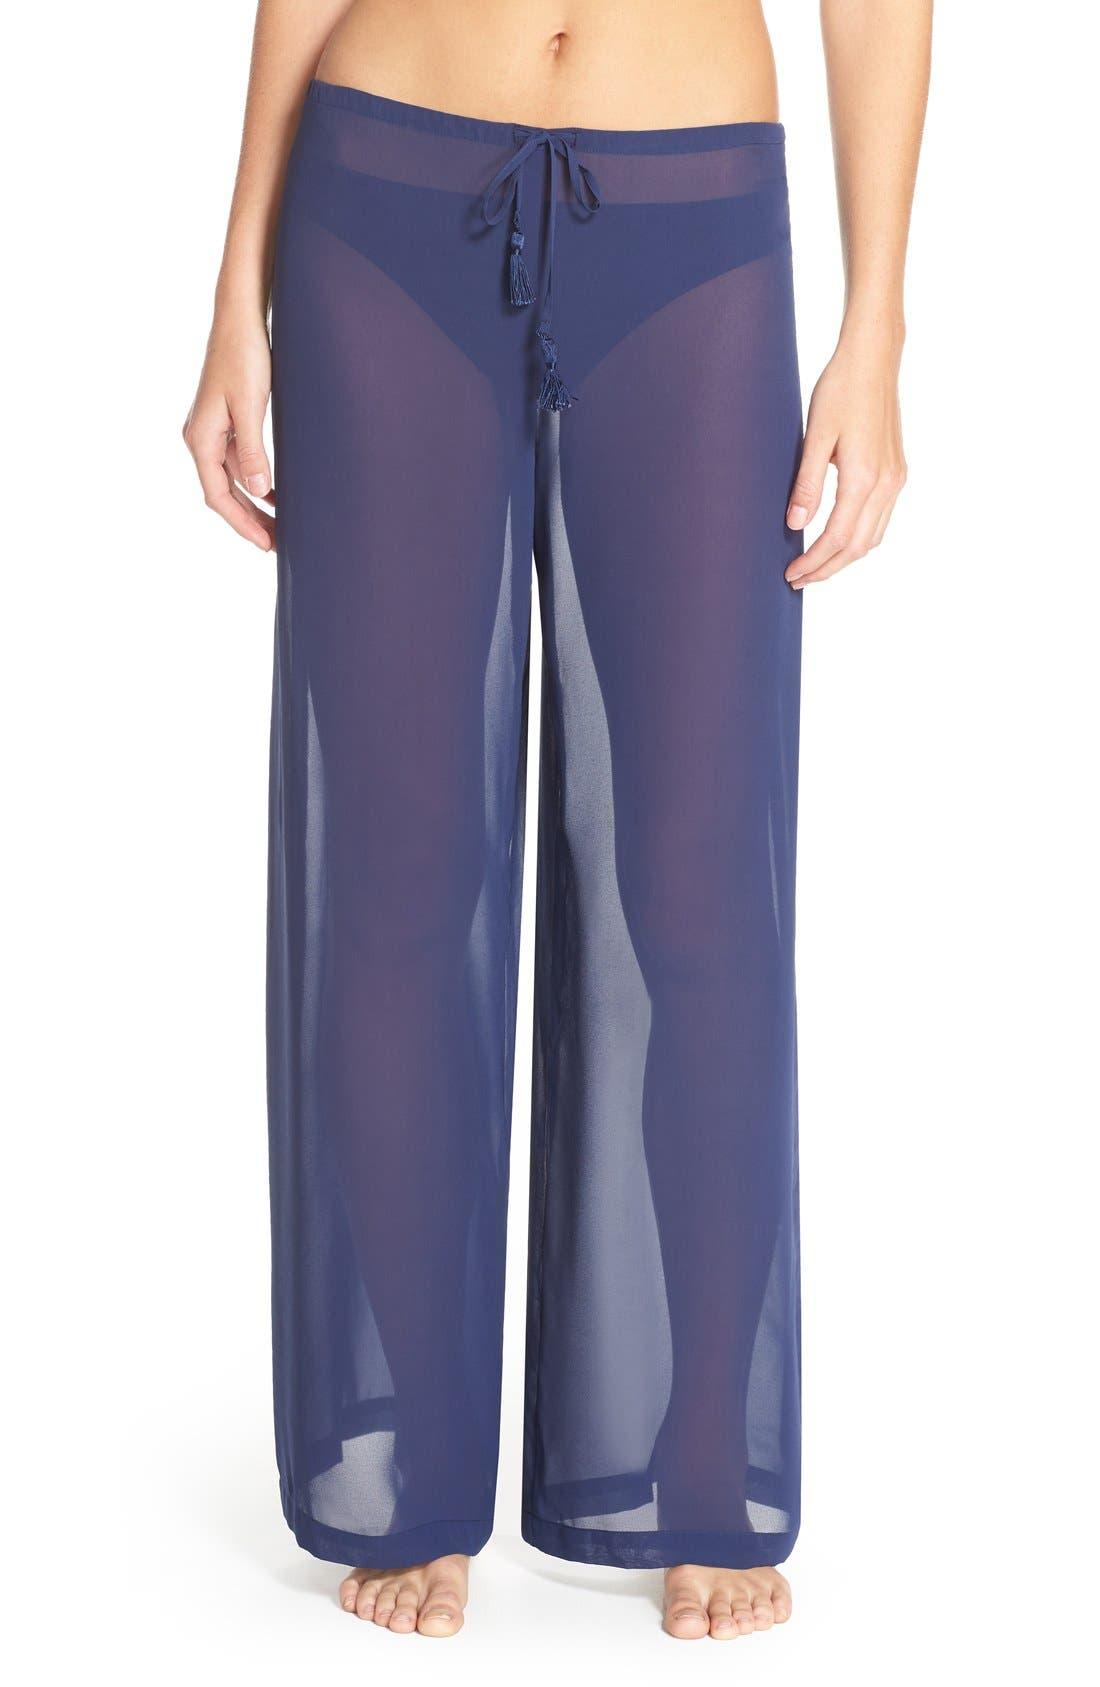 Tommy Bahama Chiffon Cover-Up Pants